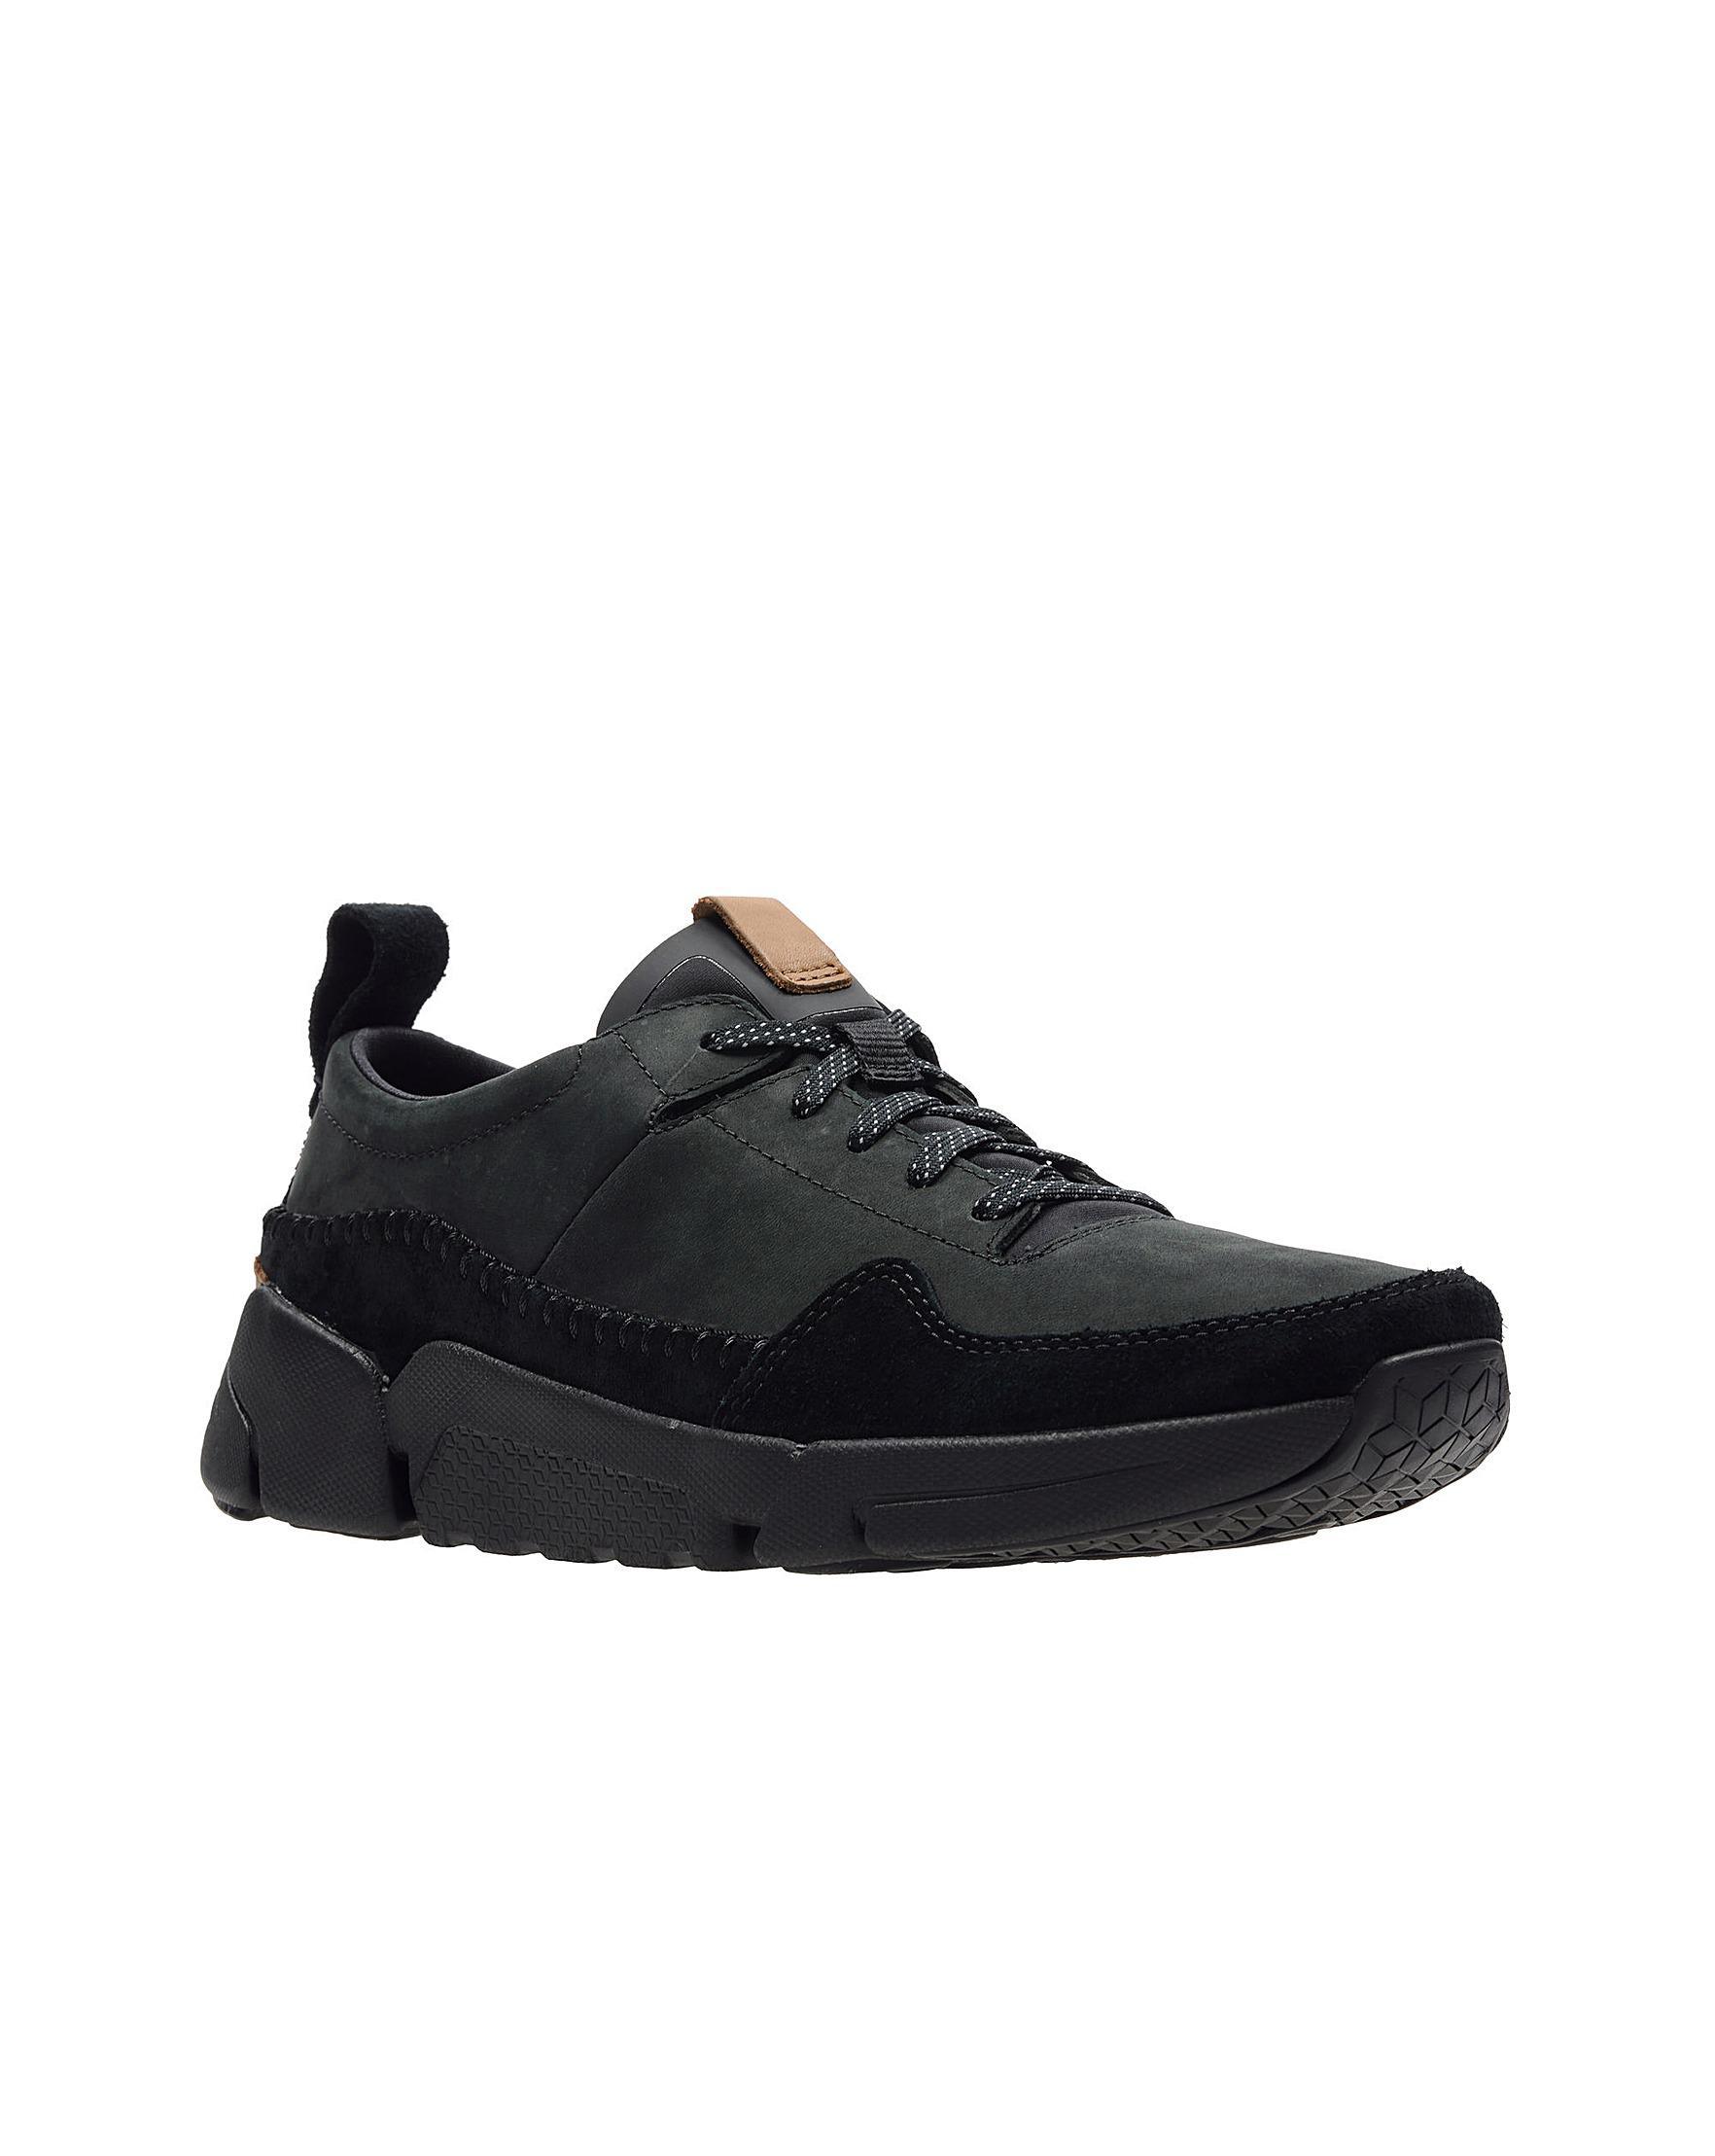 Clarks Triactive Run Sneaker in Black for Men - Save 11% - Lyst f4170e9c1c9